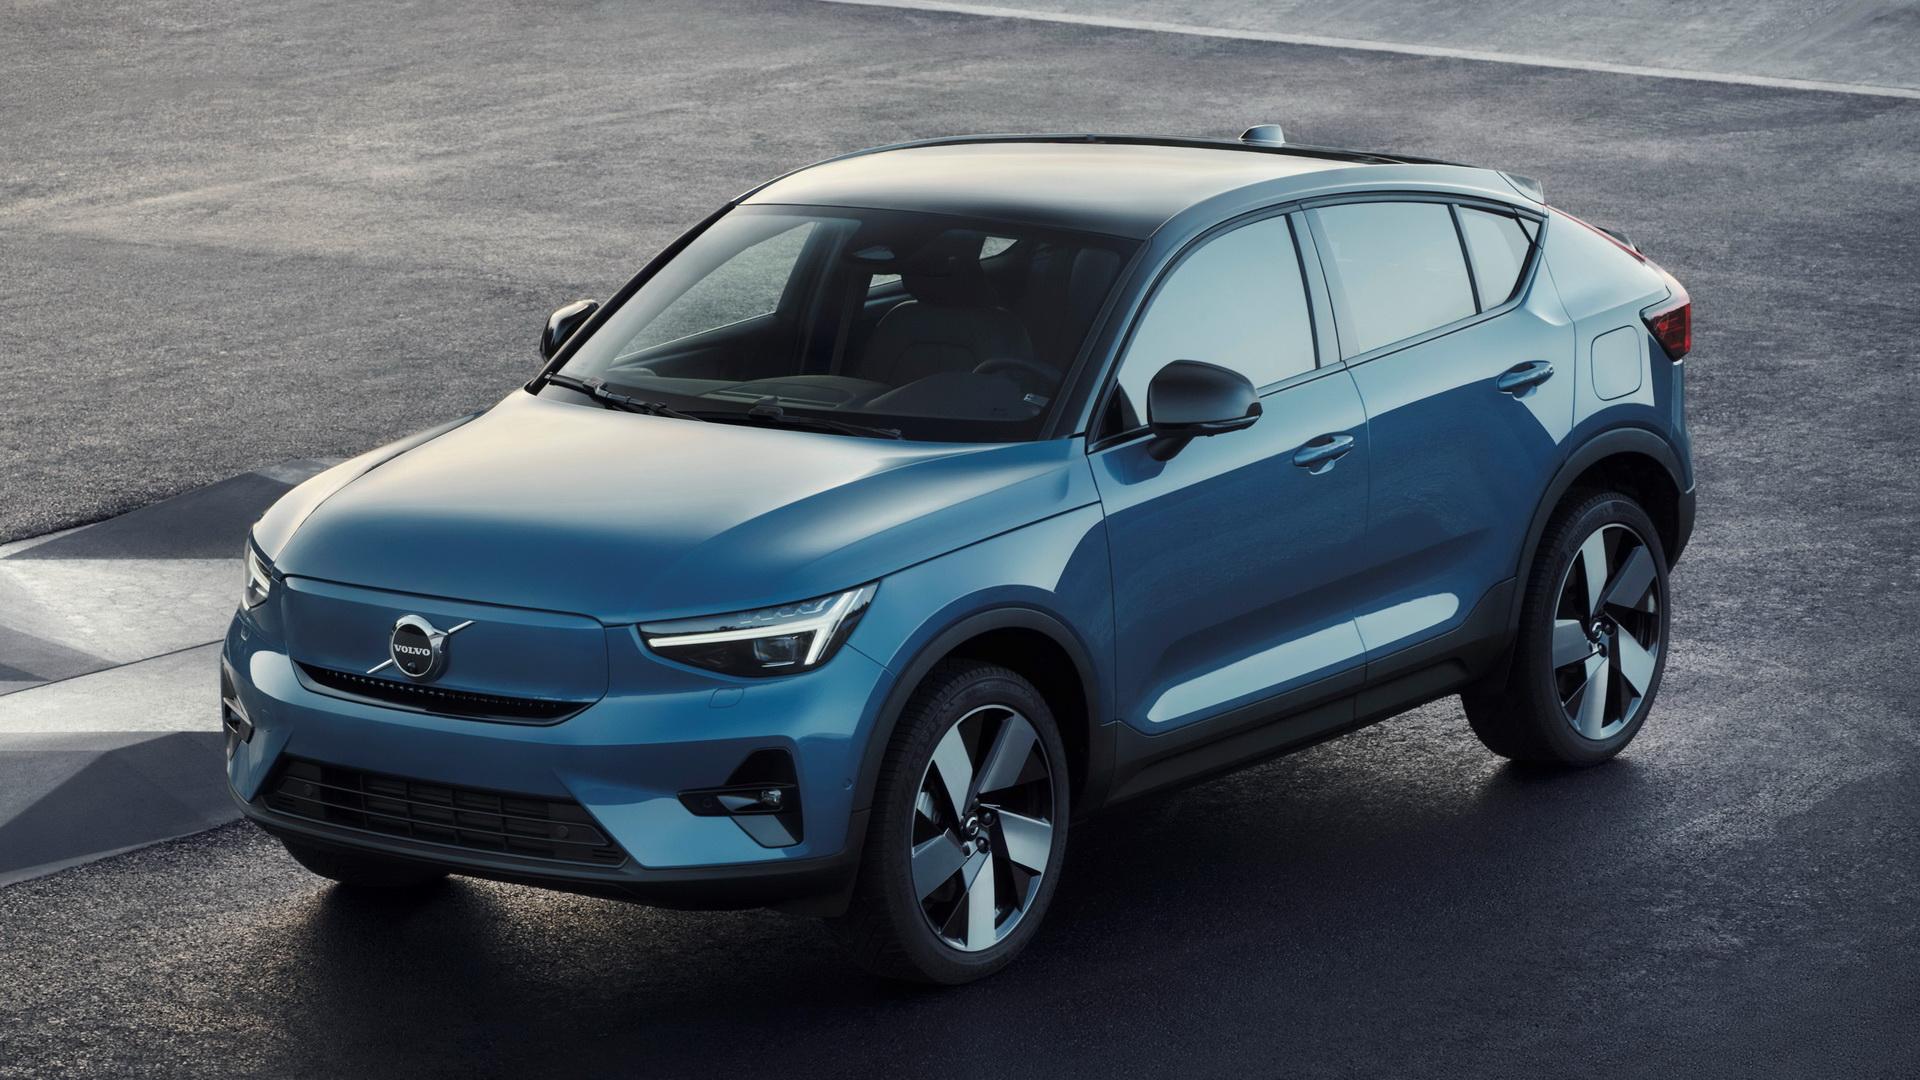 Volvo C40: Νέο ηλεκτρικό SUV με κουπέ αισθητική! [vid]